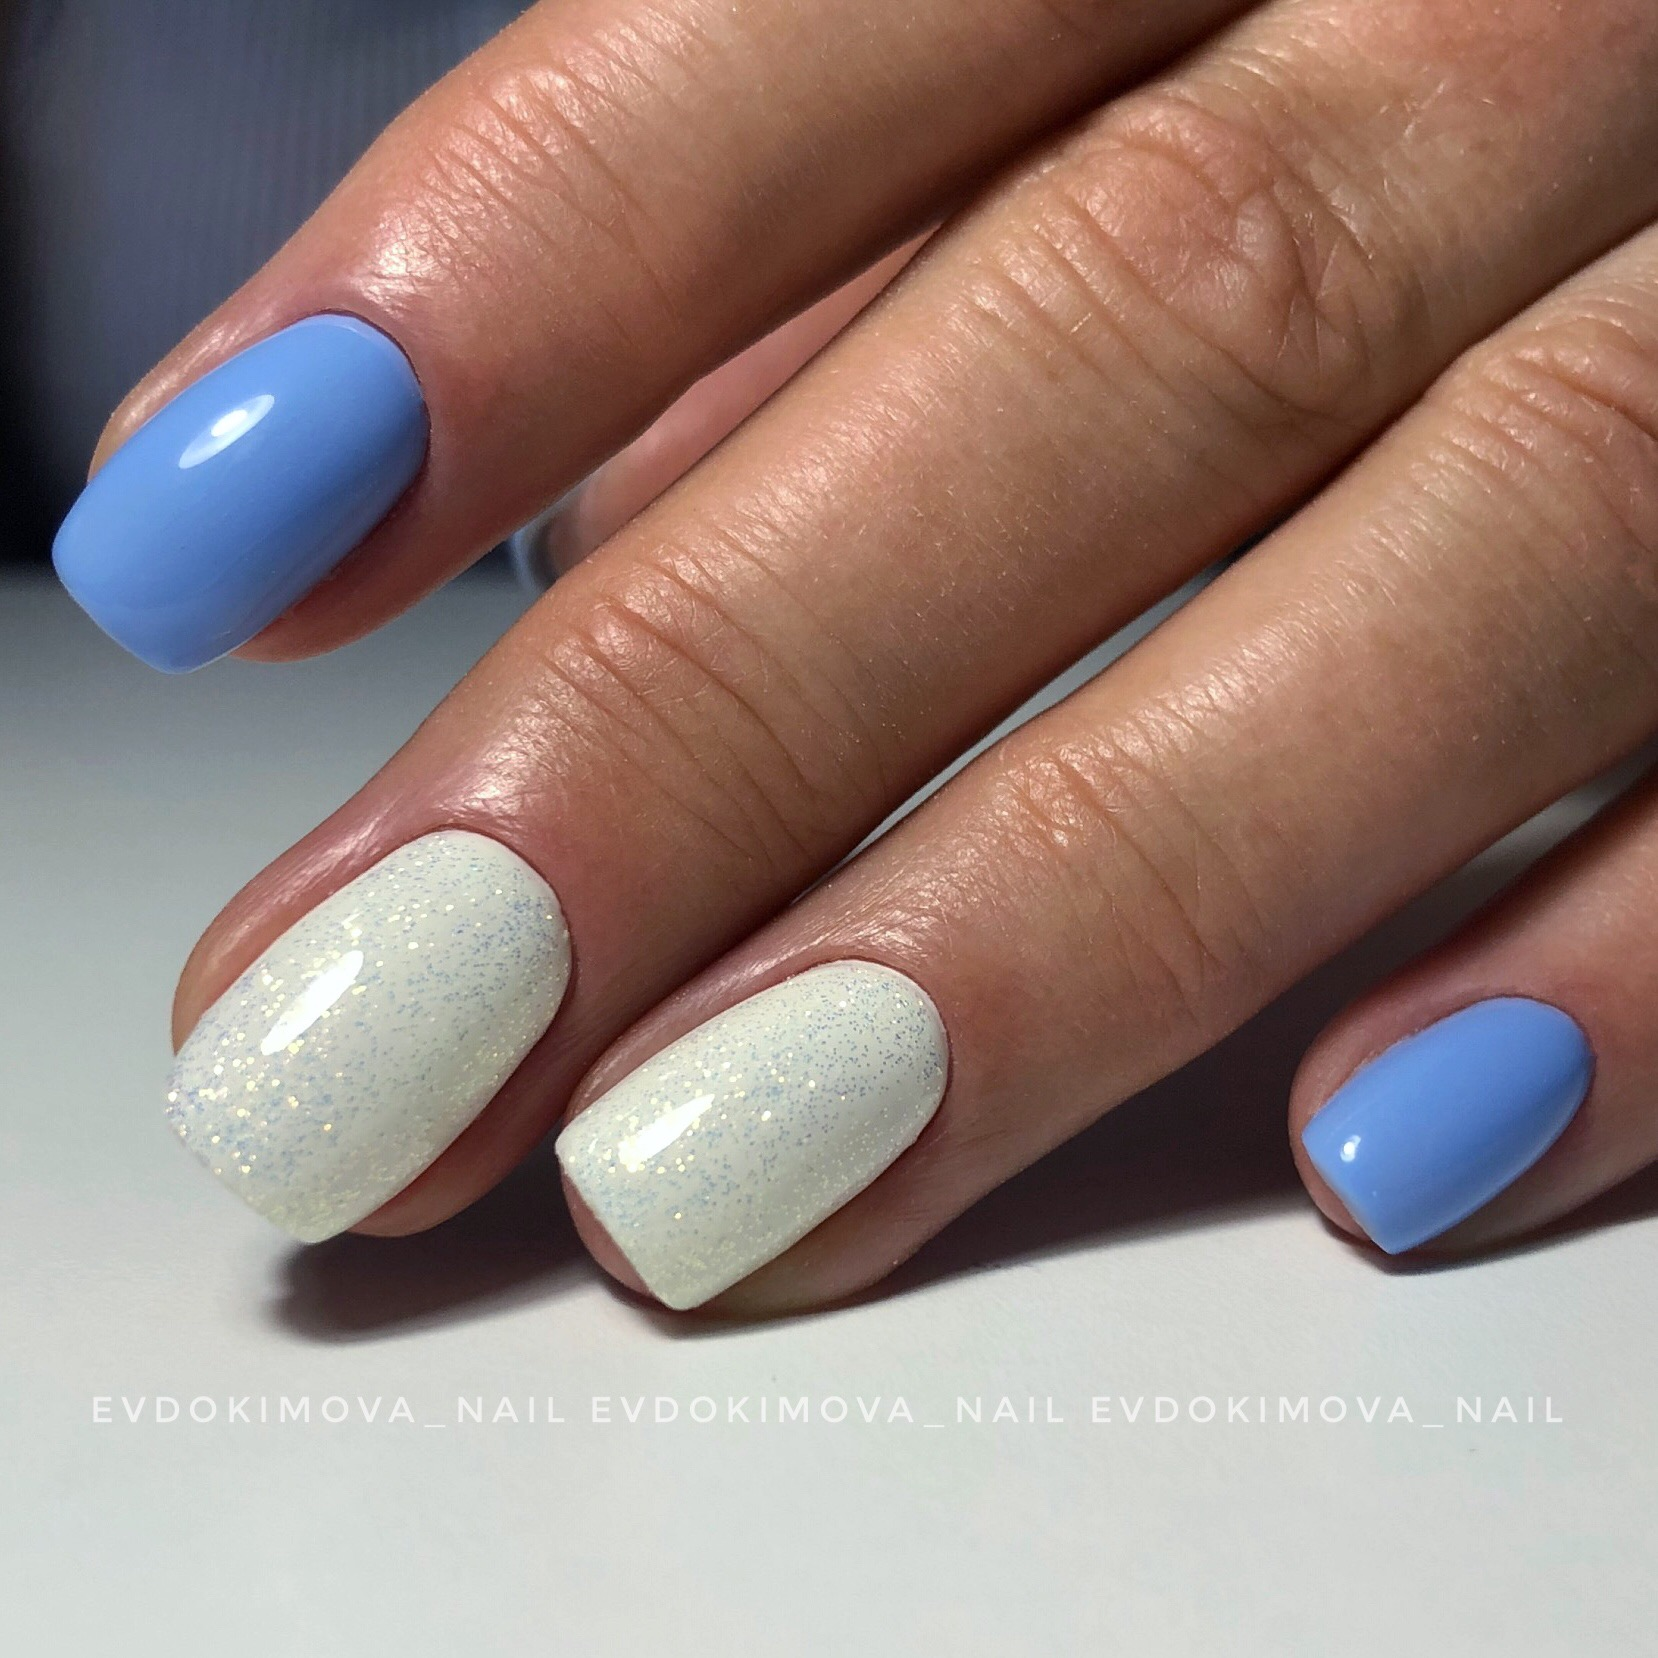 Маникюр с блестками на короткие ногти.